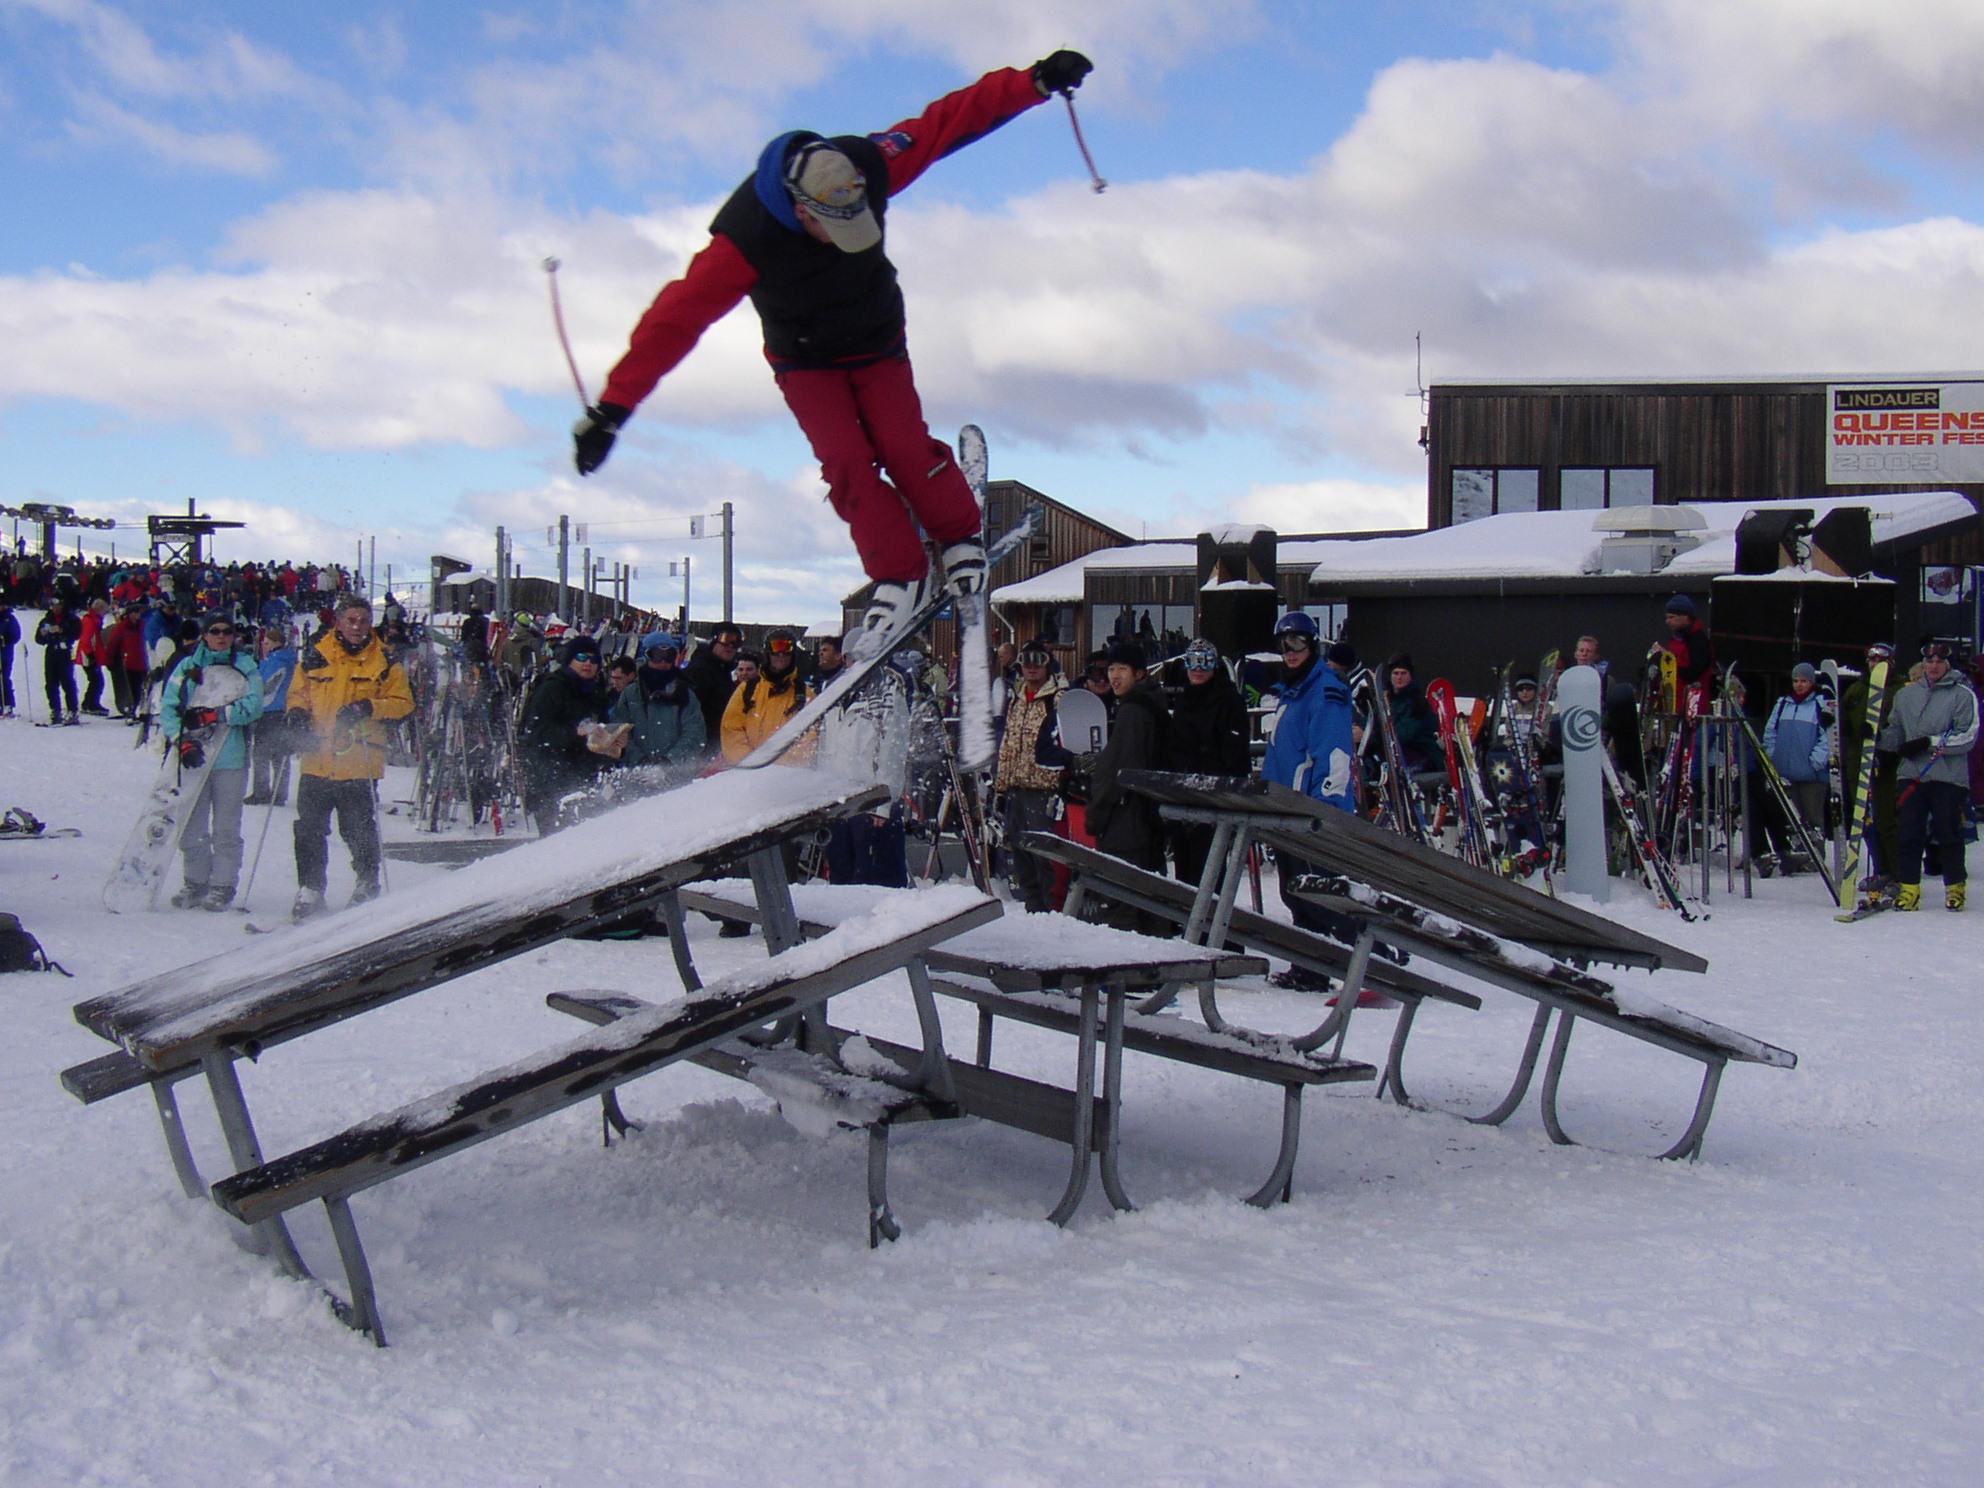 Skier jumping tables, Coronet Peak